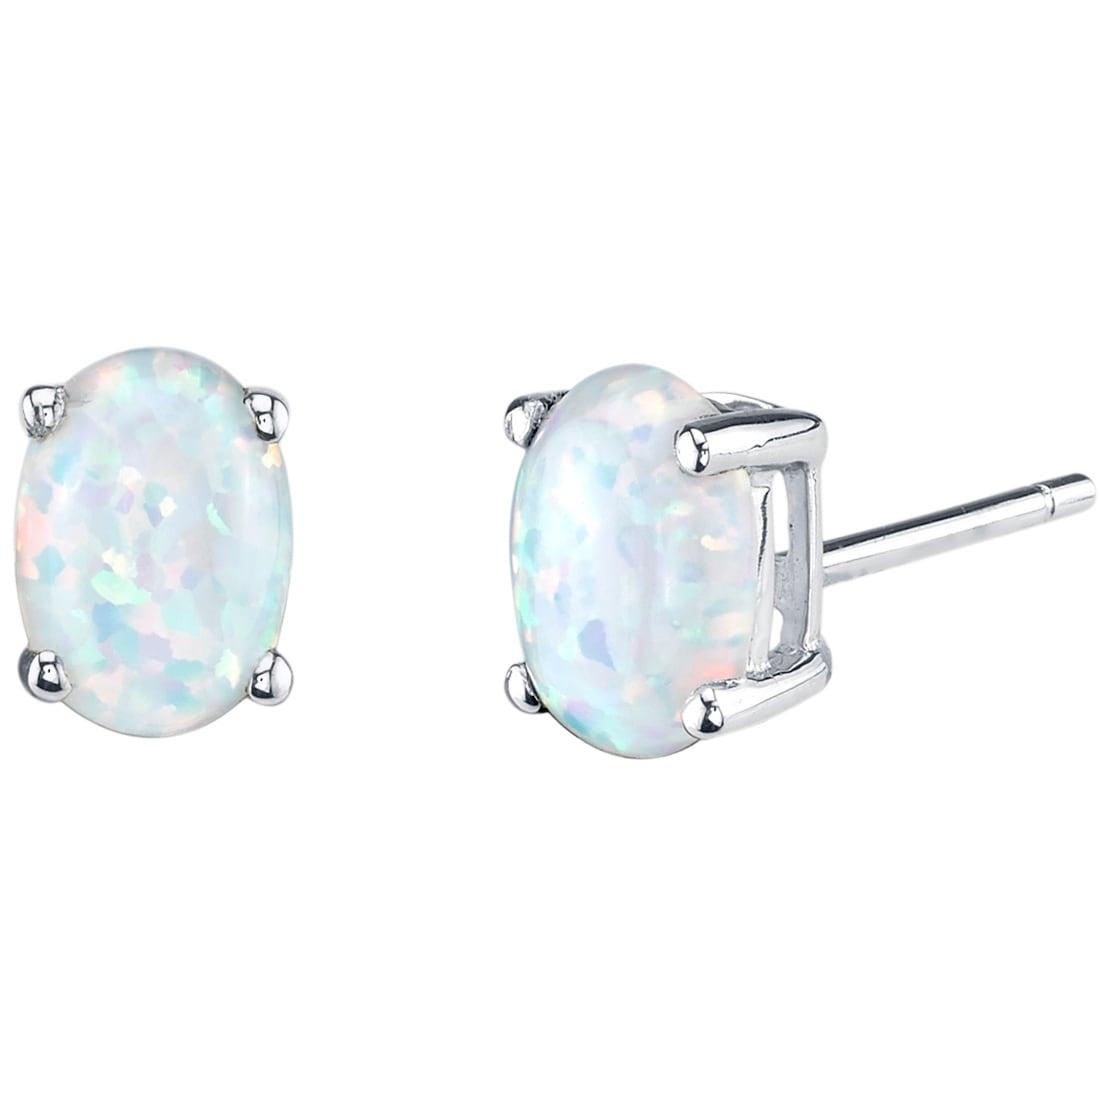 14k Oravo White Gold Oval Shape Created Opal Stud Earrings